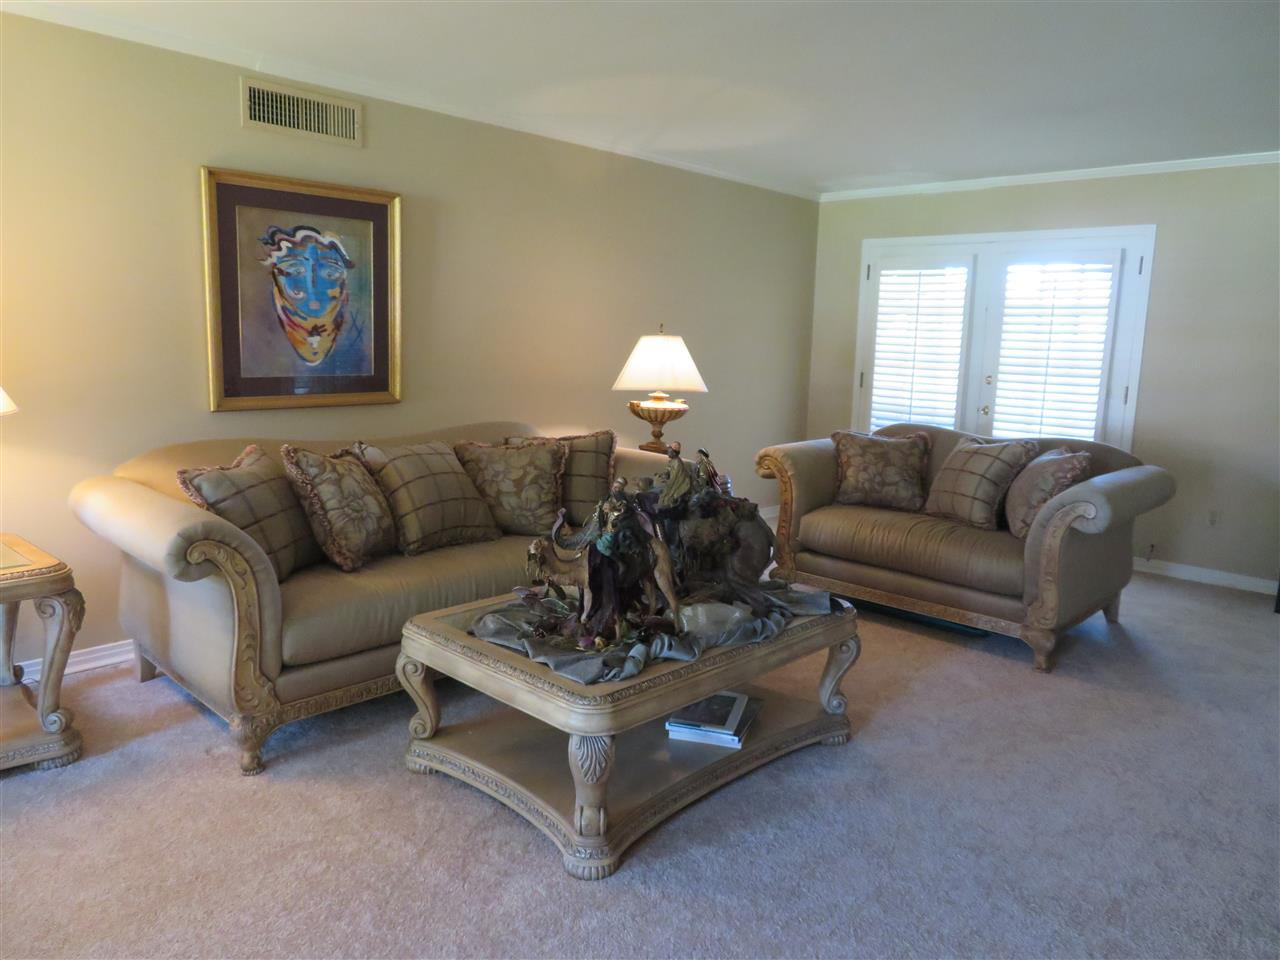 111 Country Club Rd, Pensacola, FL 32507